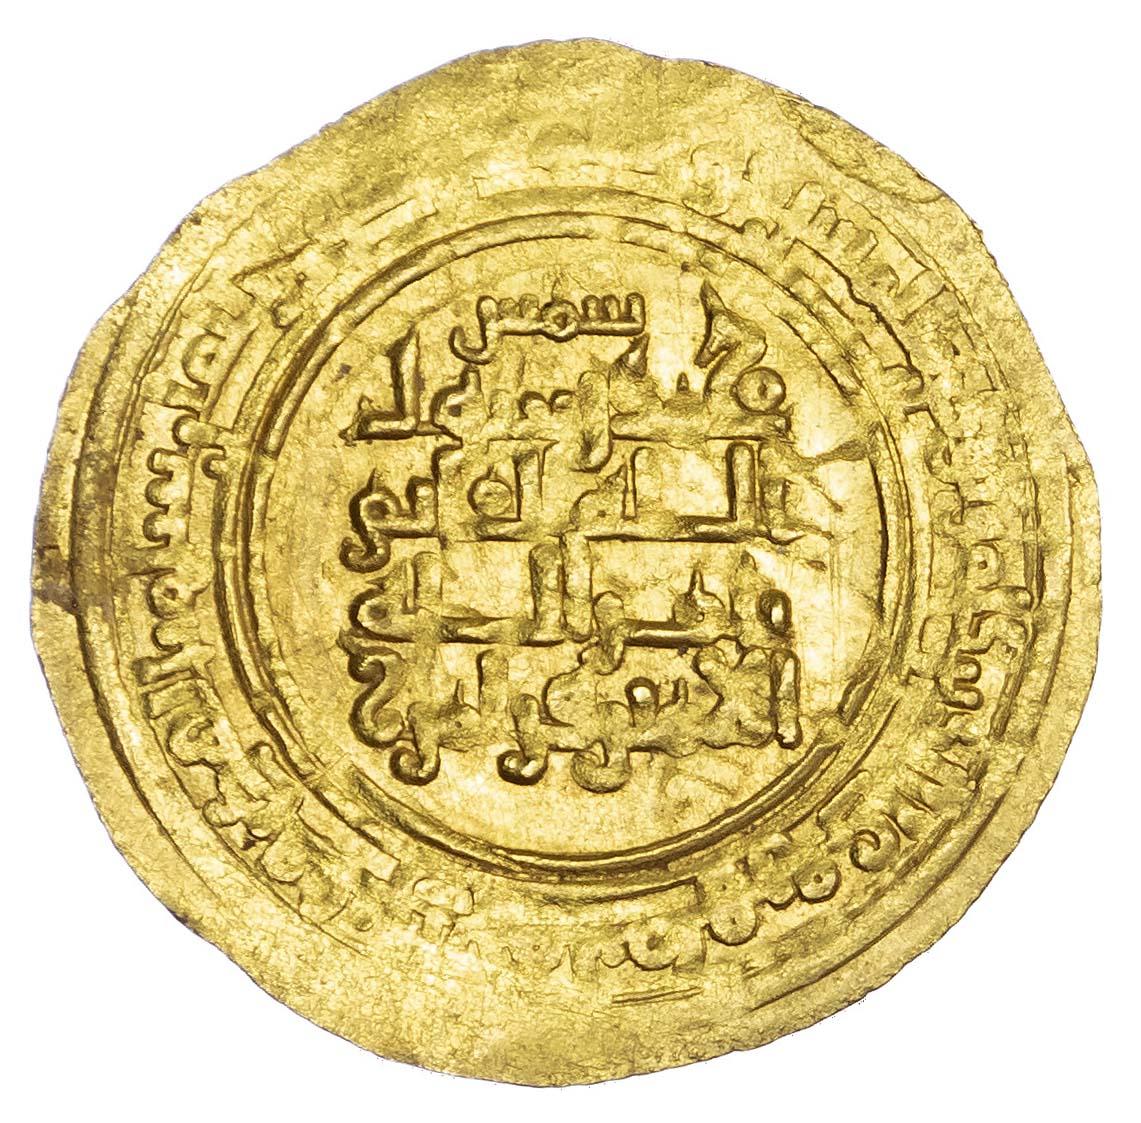 Kakwayhid, Faramurz b. Muhammad, gold Dinar, AH435 / 1044 AD